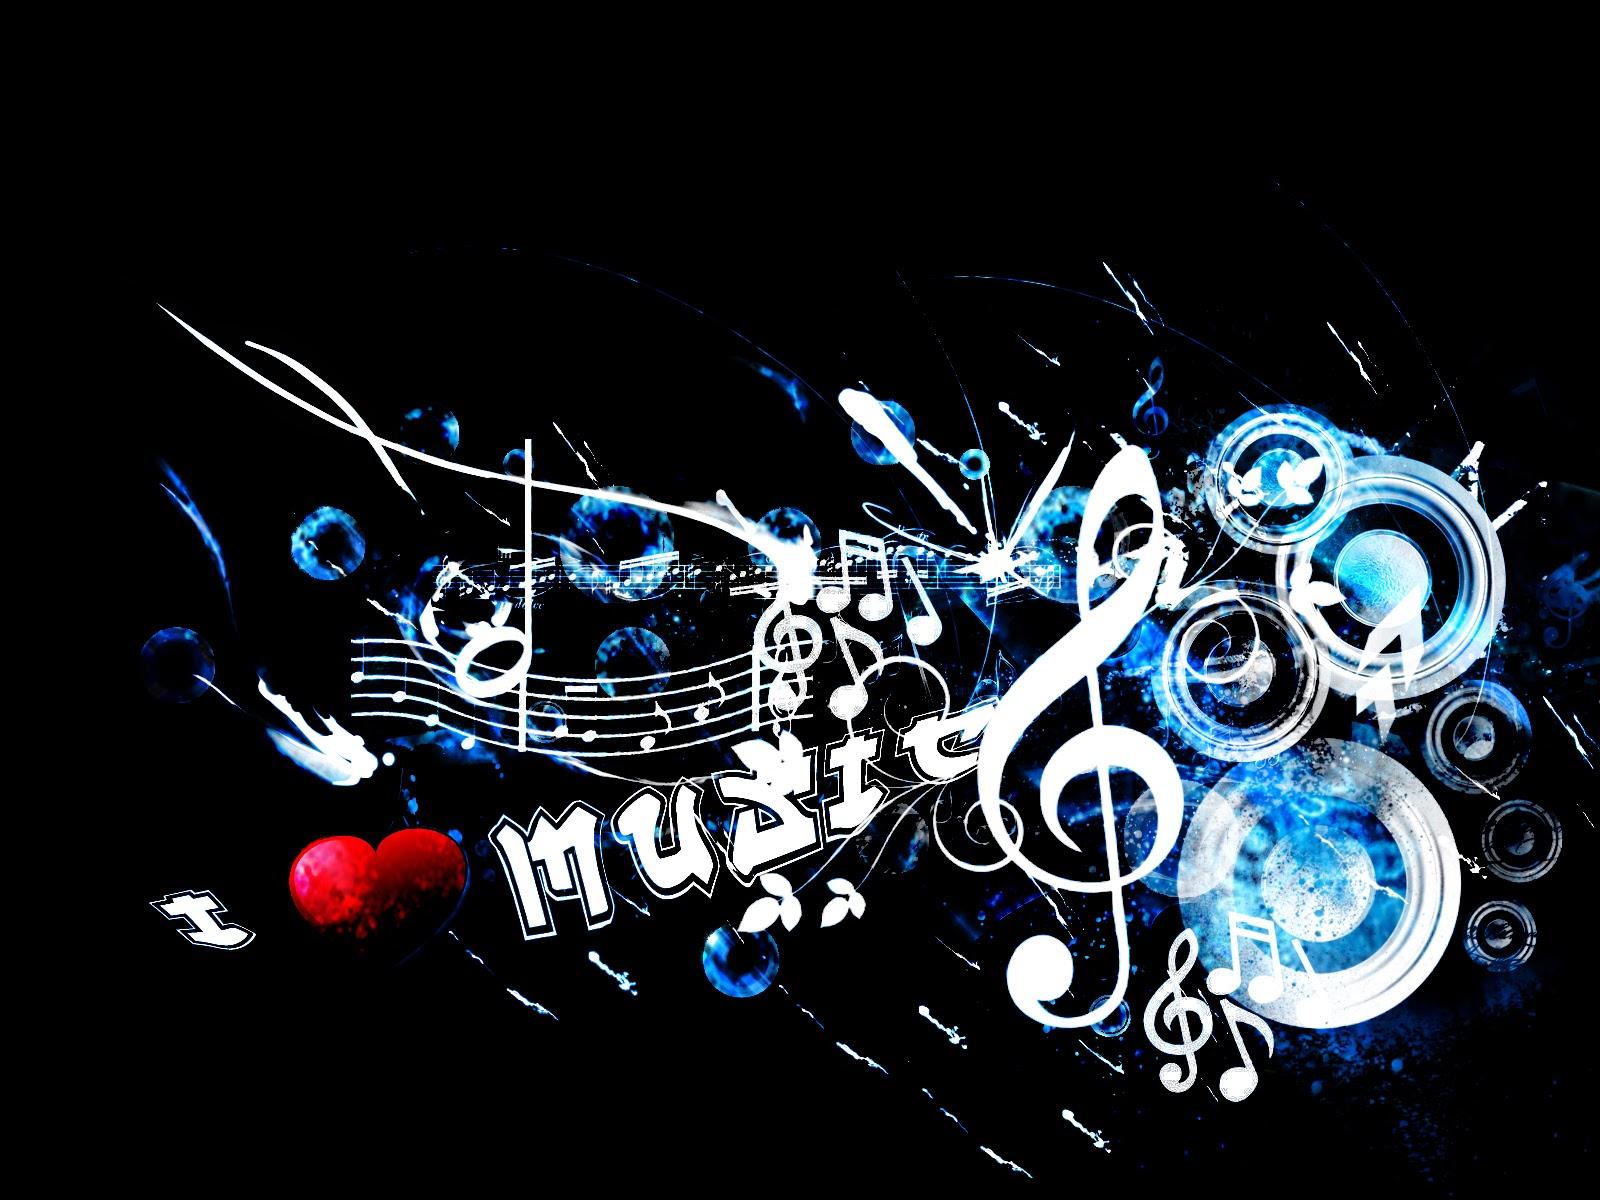 Bedroom Music